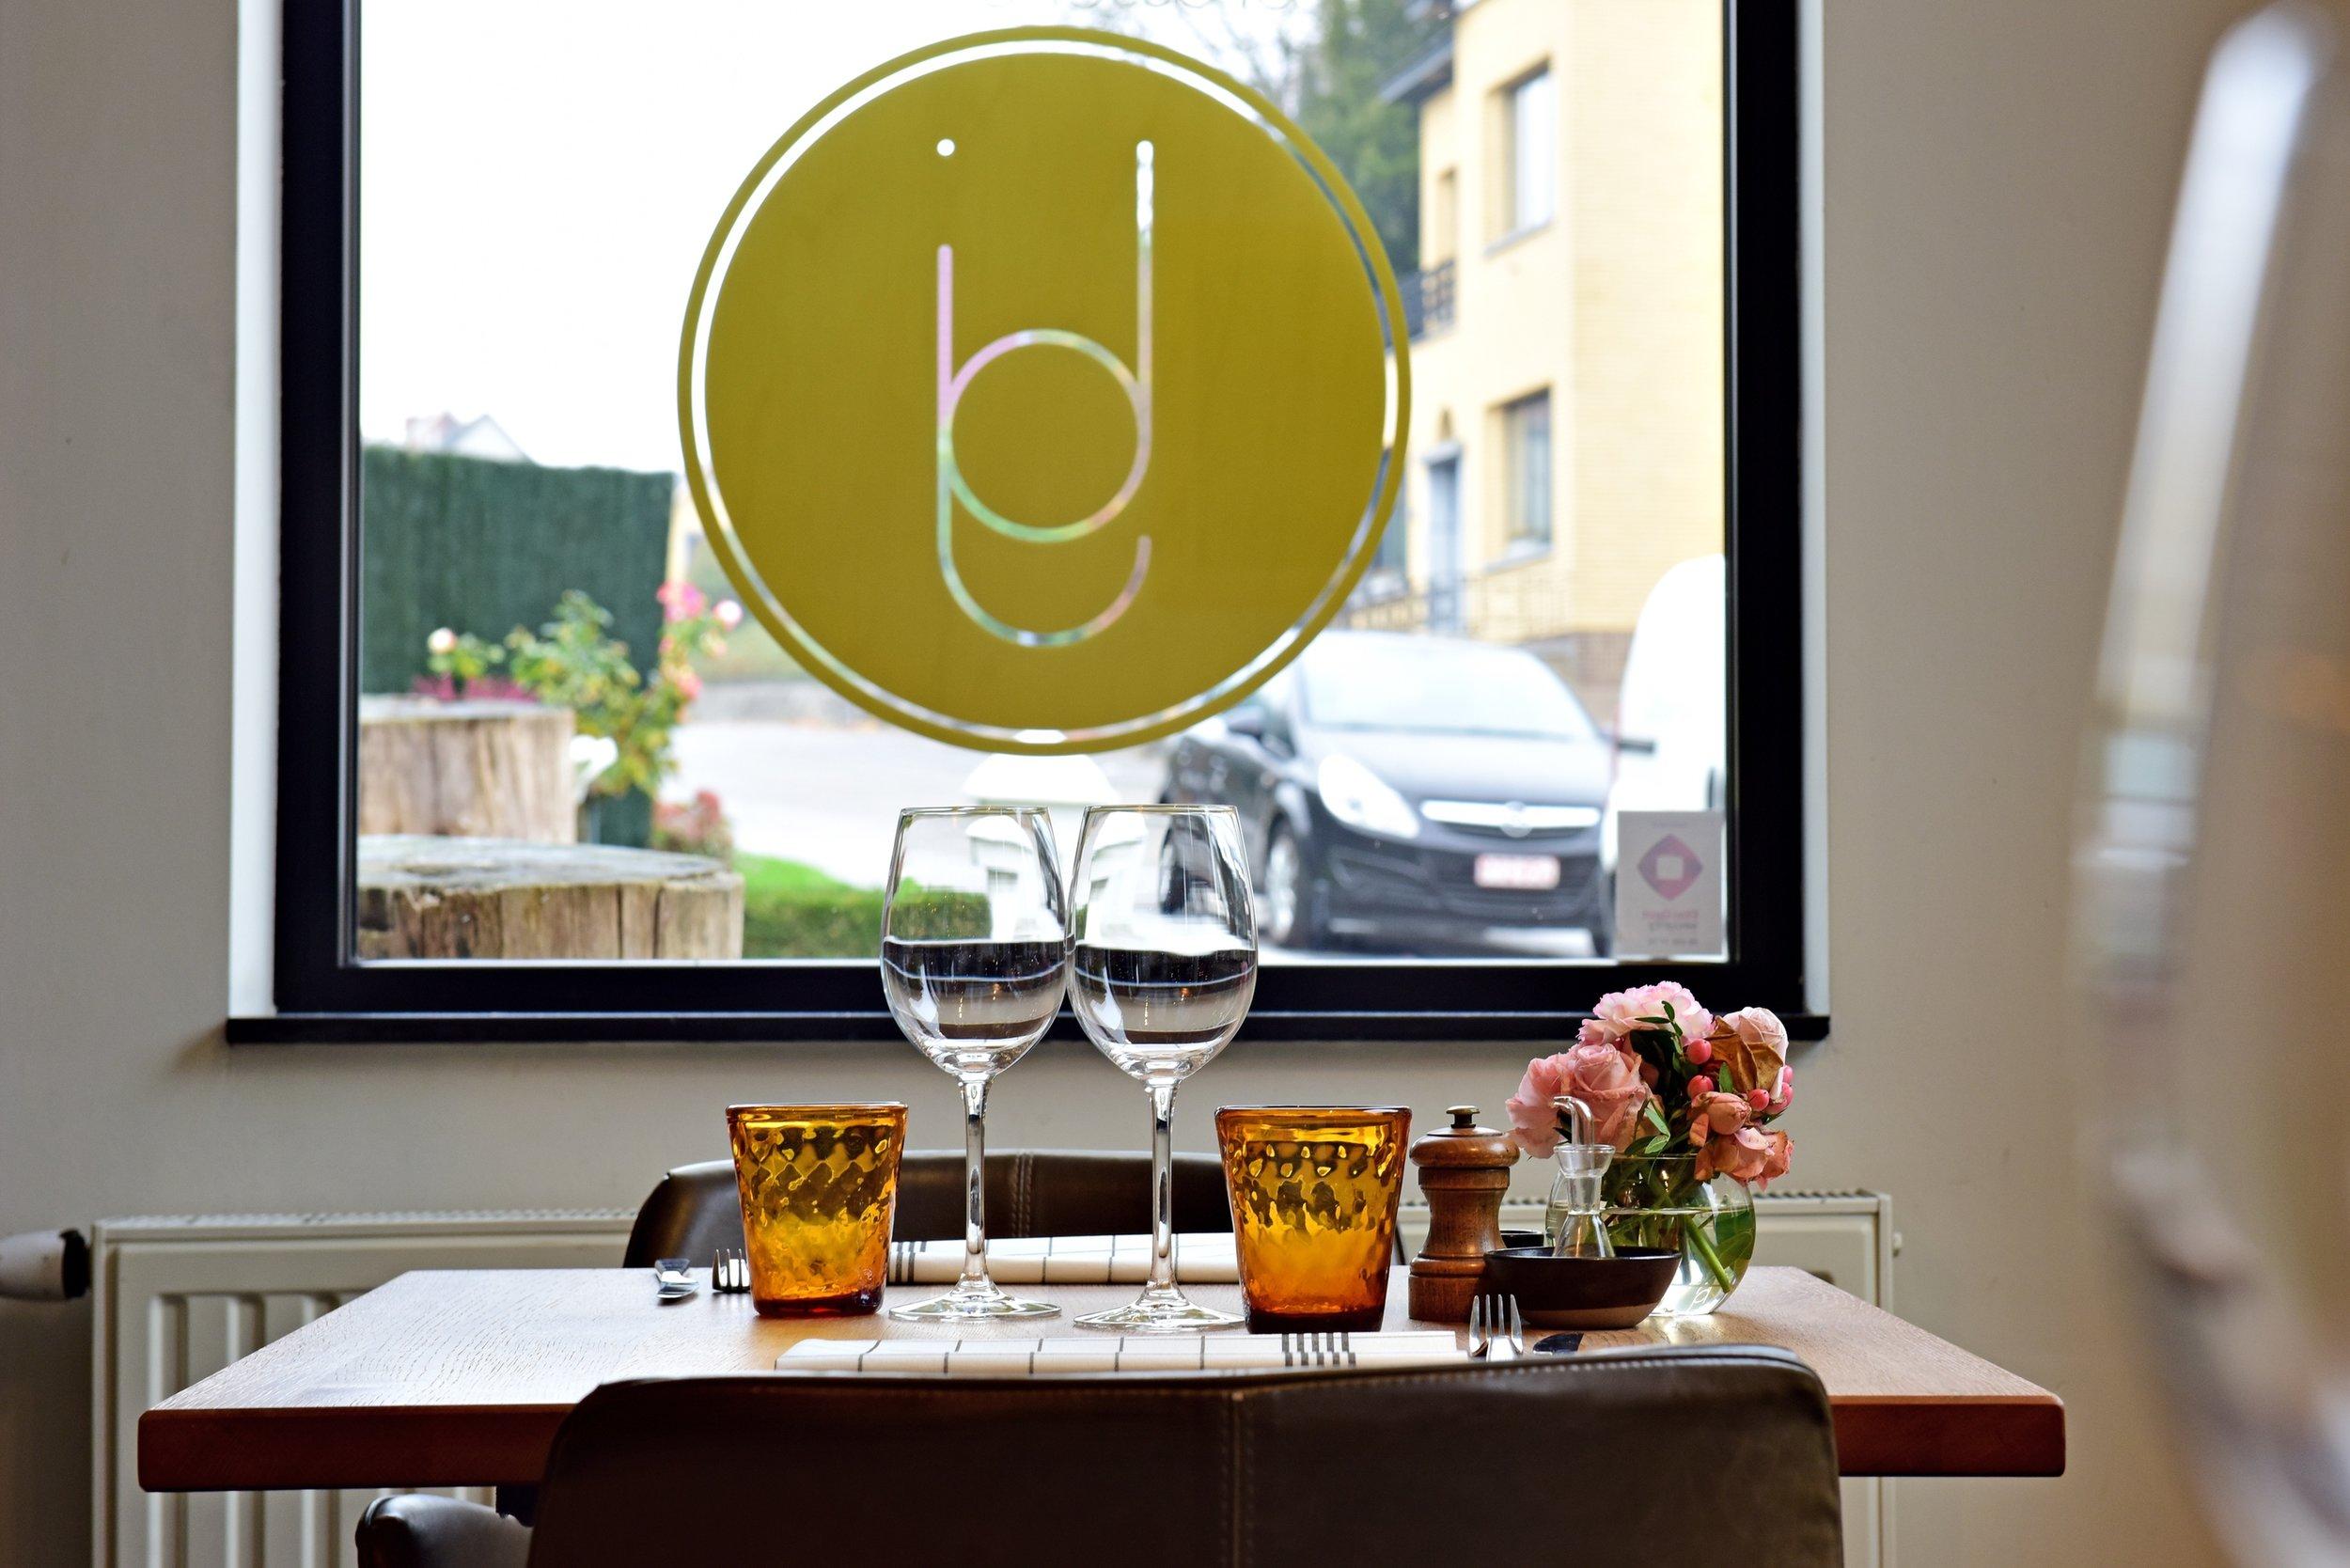 7 brasserie juste restaurant Dikkelvenne tablefever bart albrecht culinair fotograaf foodfotograaf.jpg